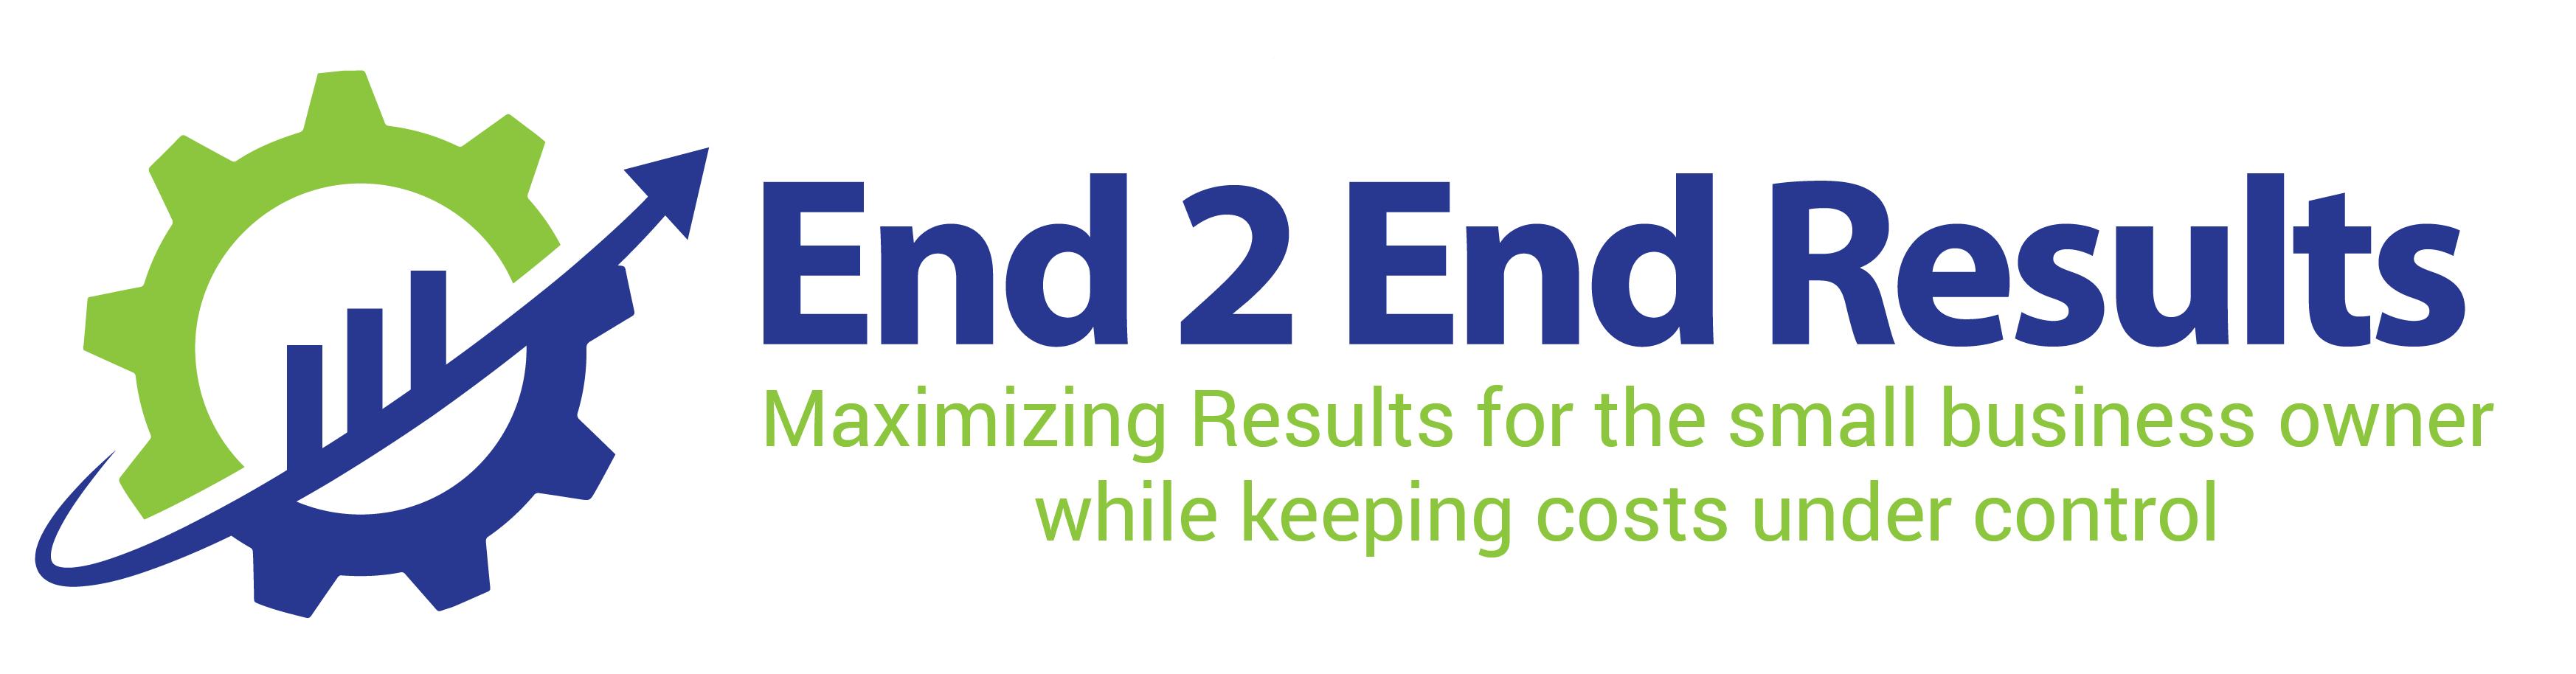 End 2 End Results Vertical Marketing Delivers